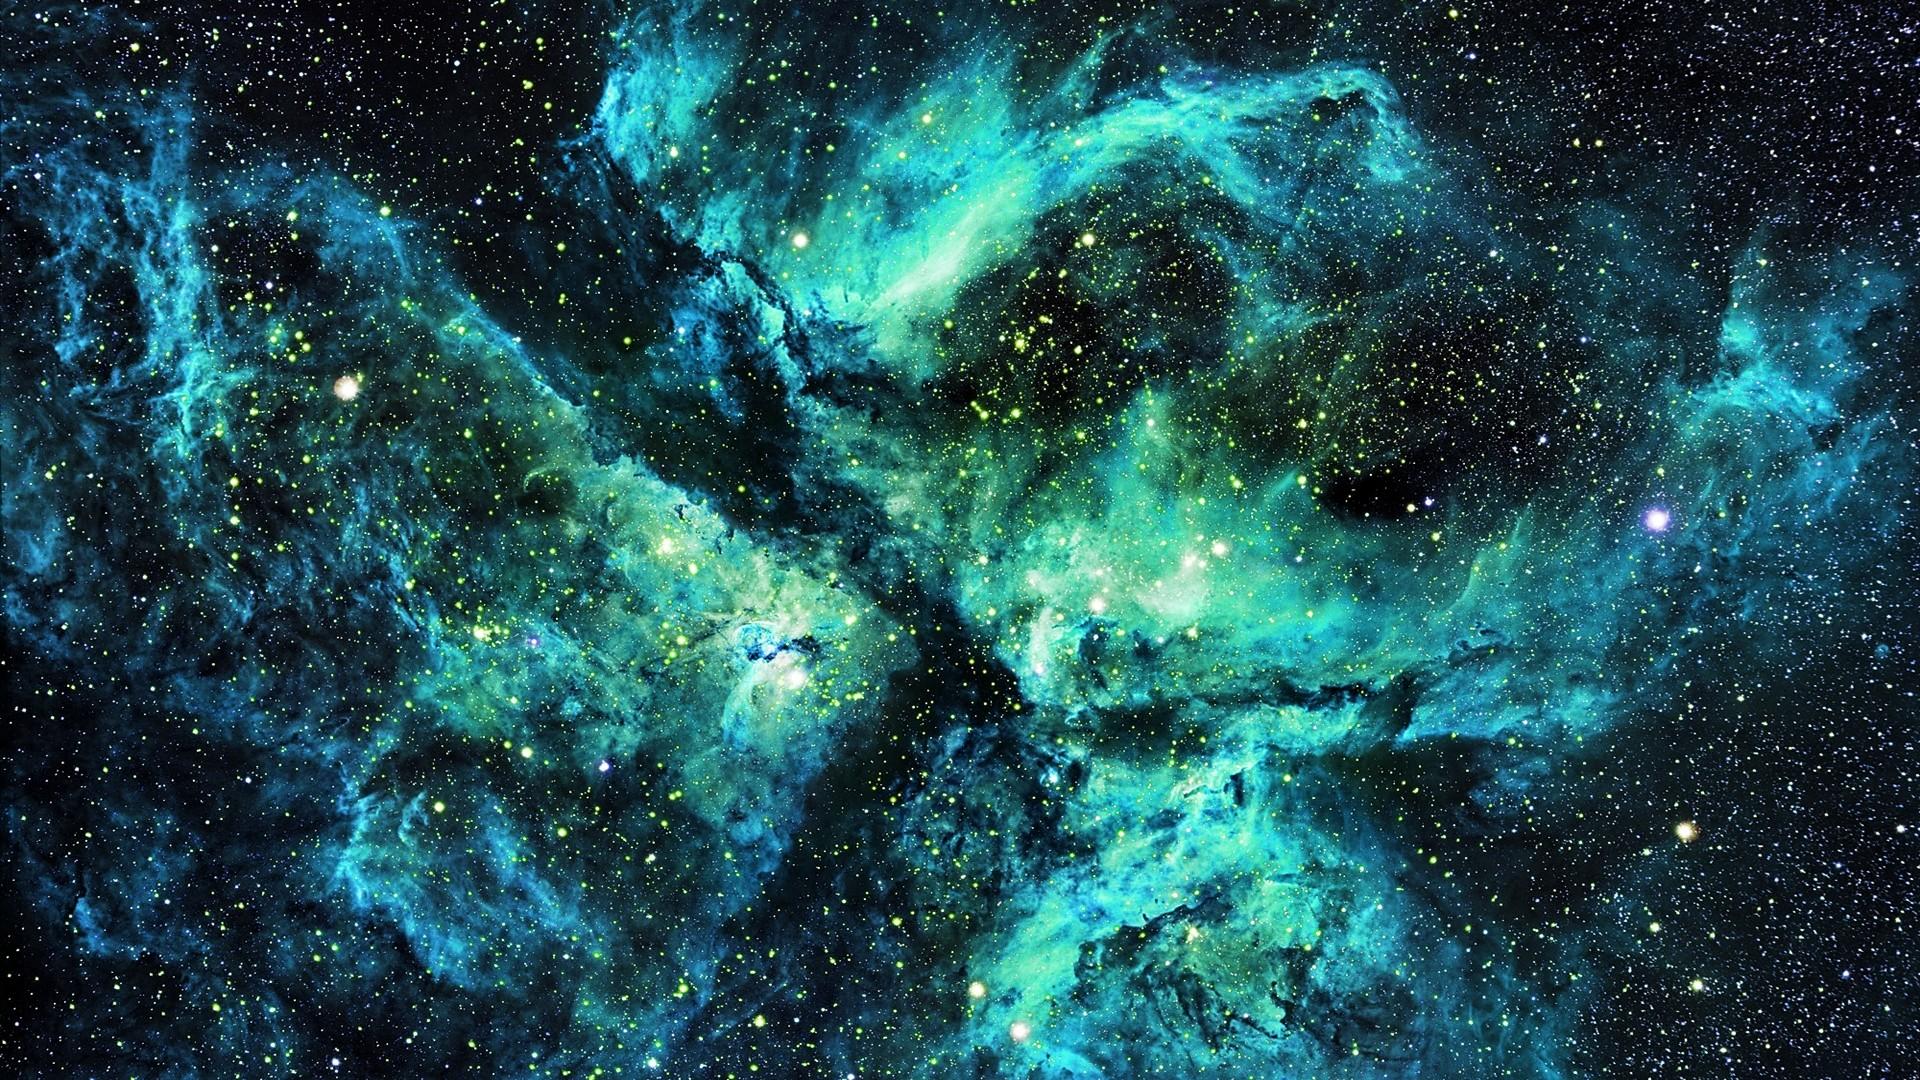 Nebula Computer Wallpapers, Desktop Backgrounds     ID .